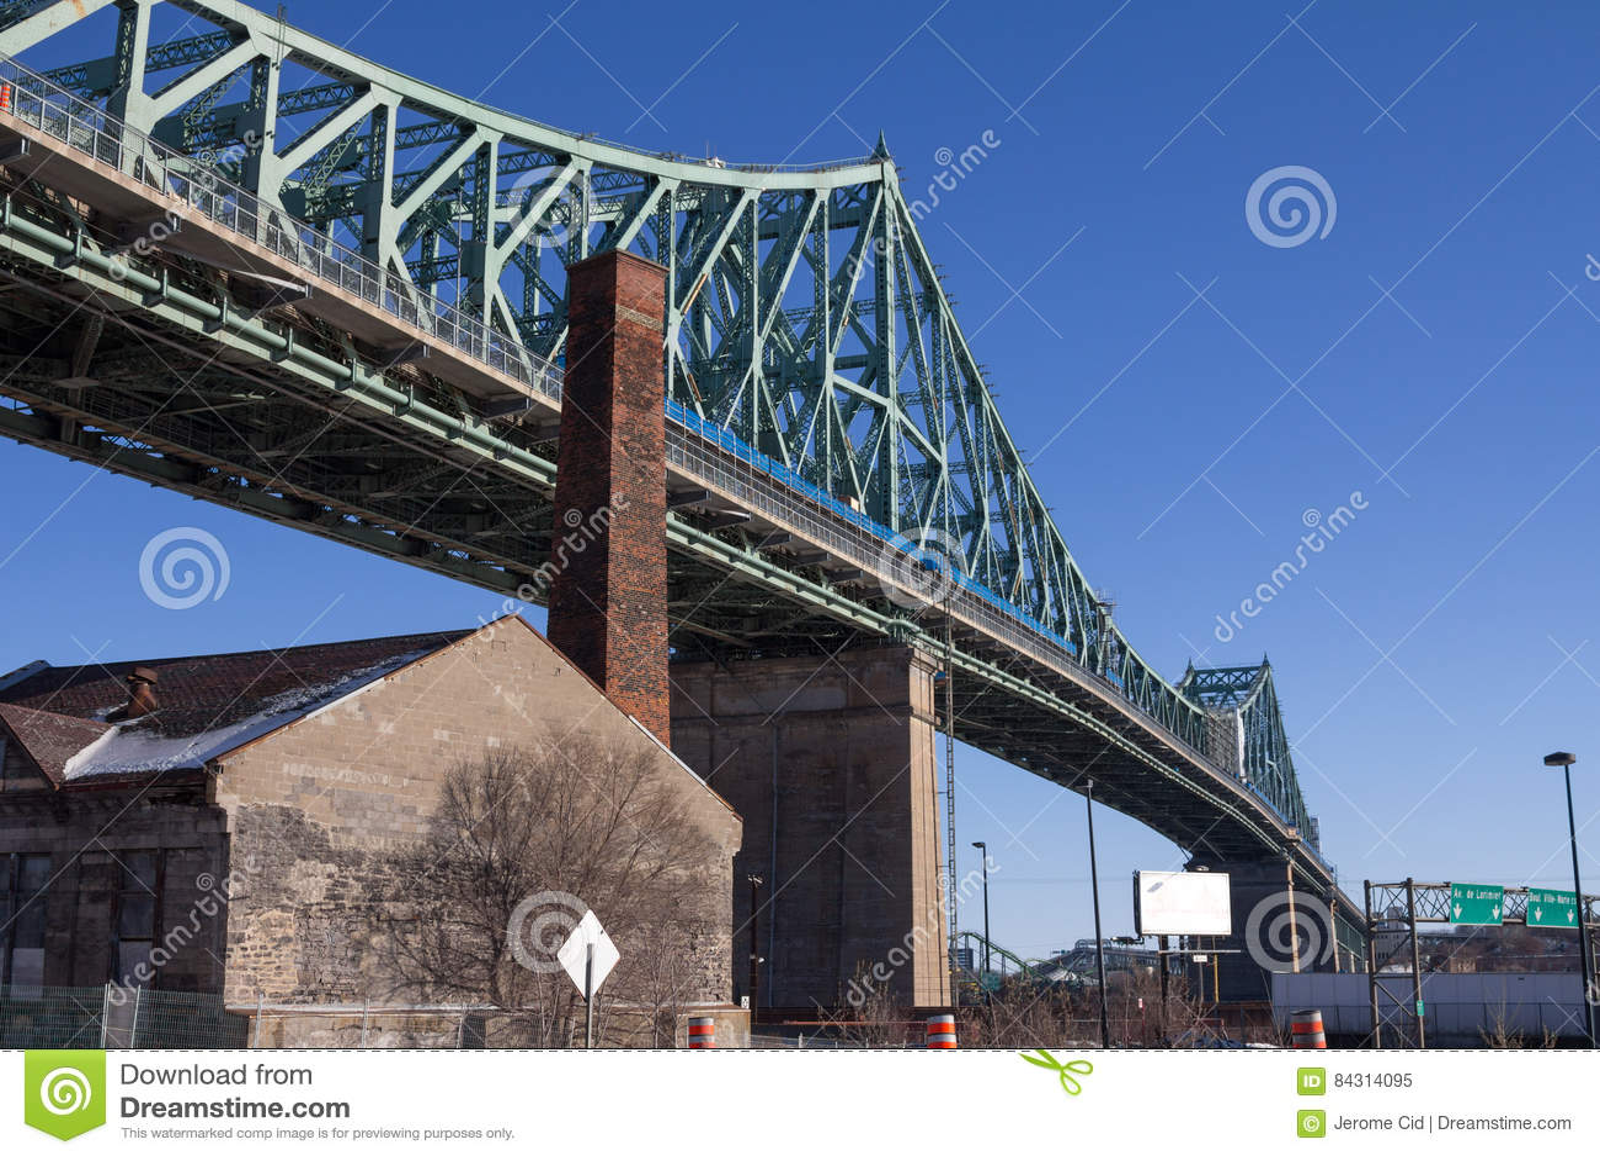 Jacques Cartier bridge in Montreal, Quebec, Canada in Winter